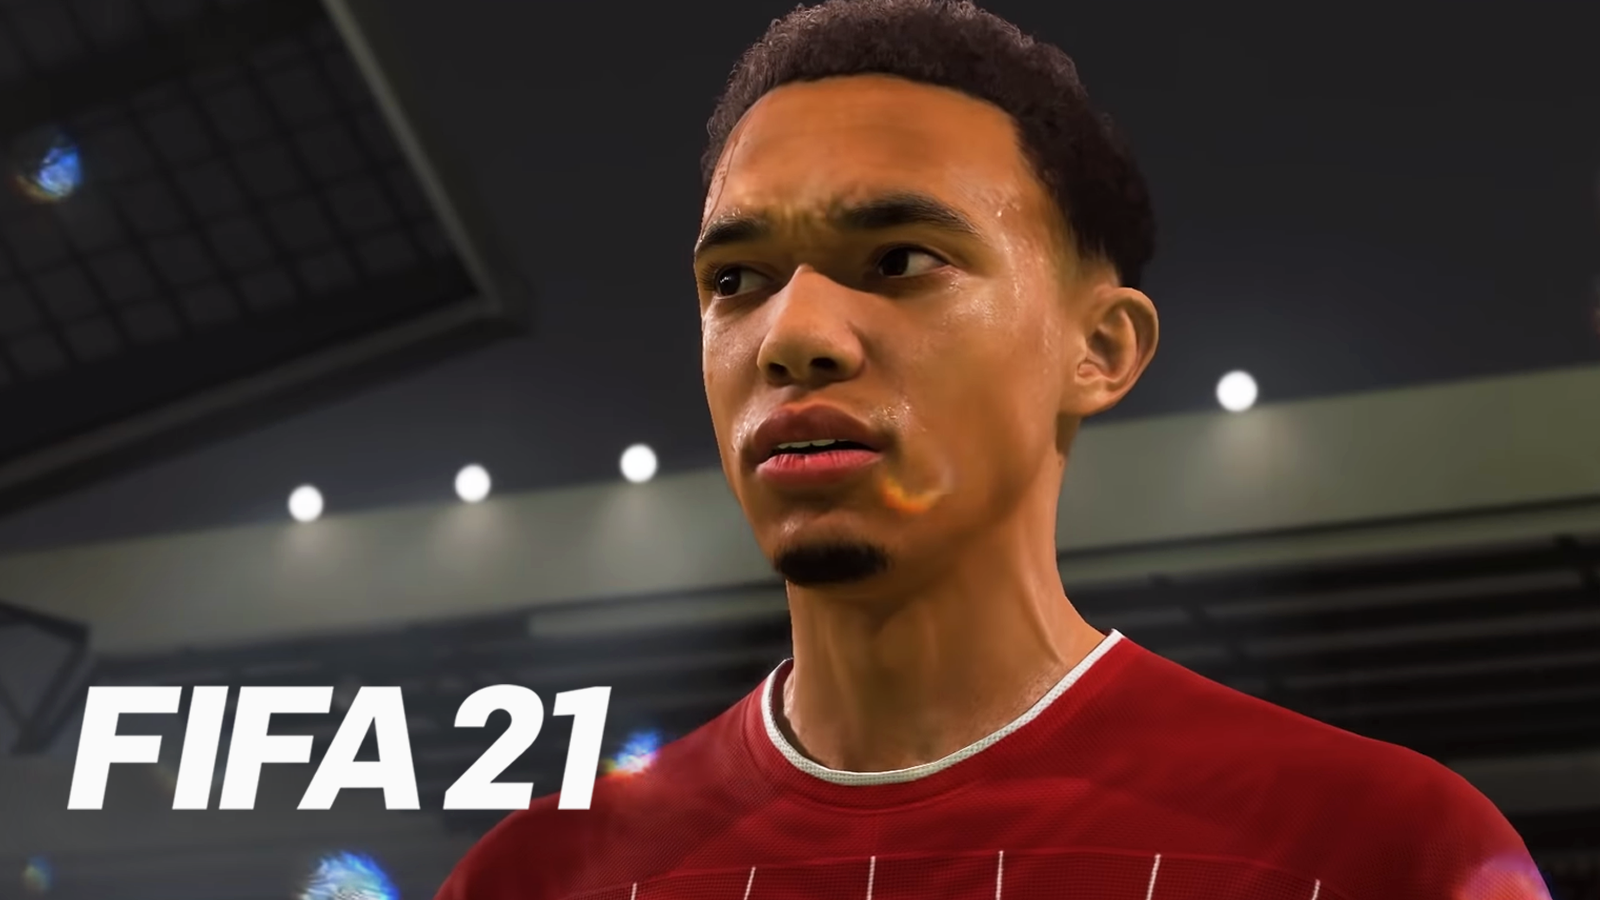 Trent Alexander-Arnold in FIFA 21